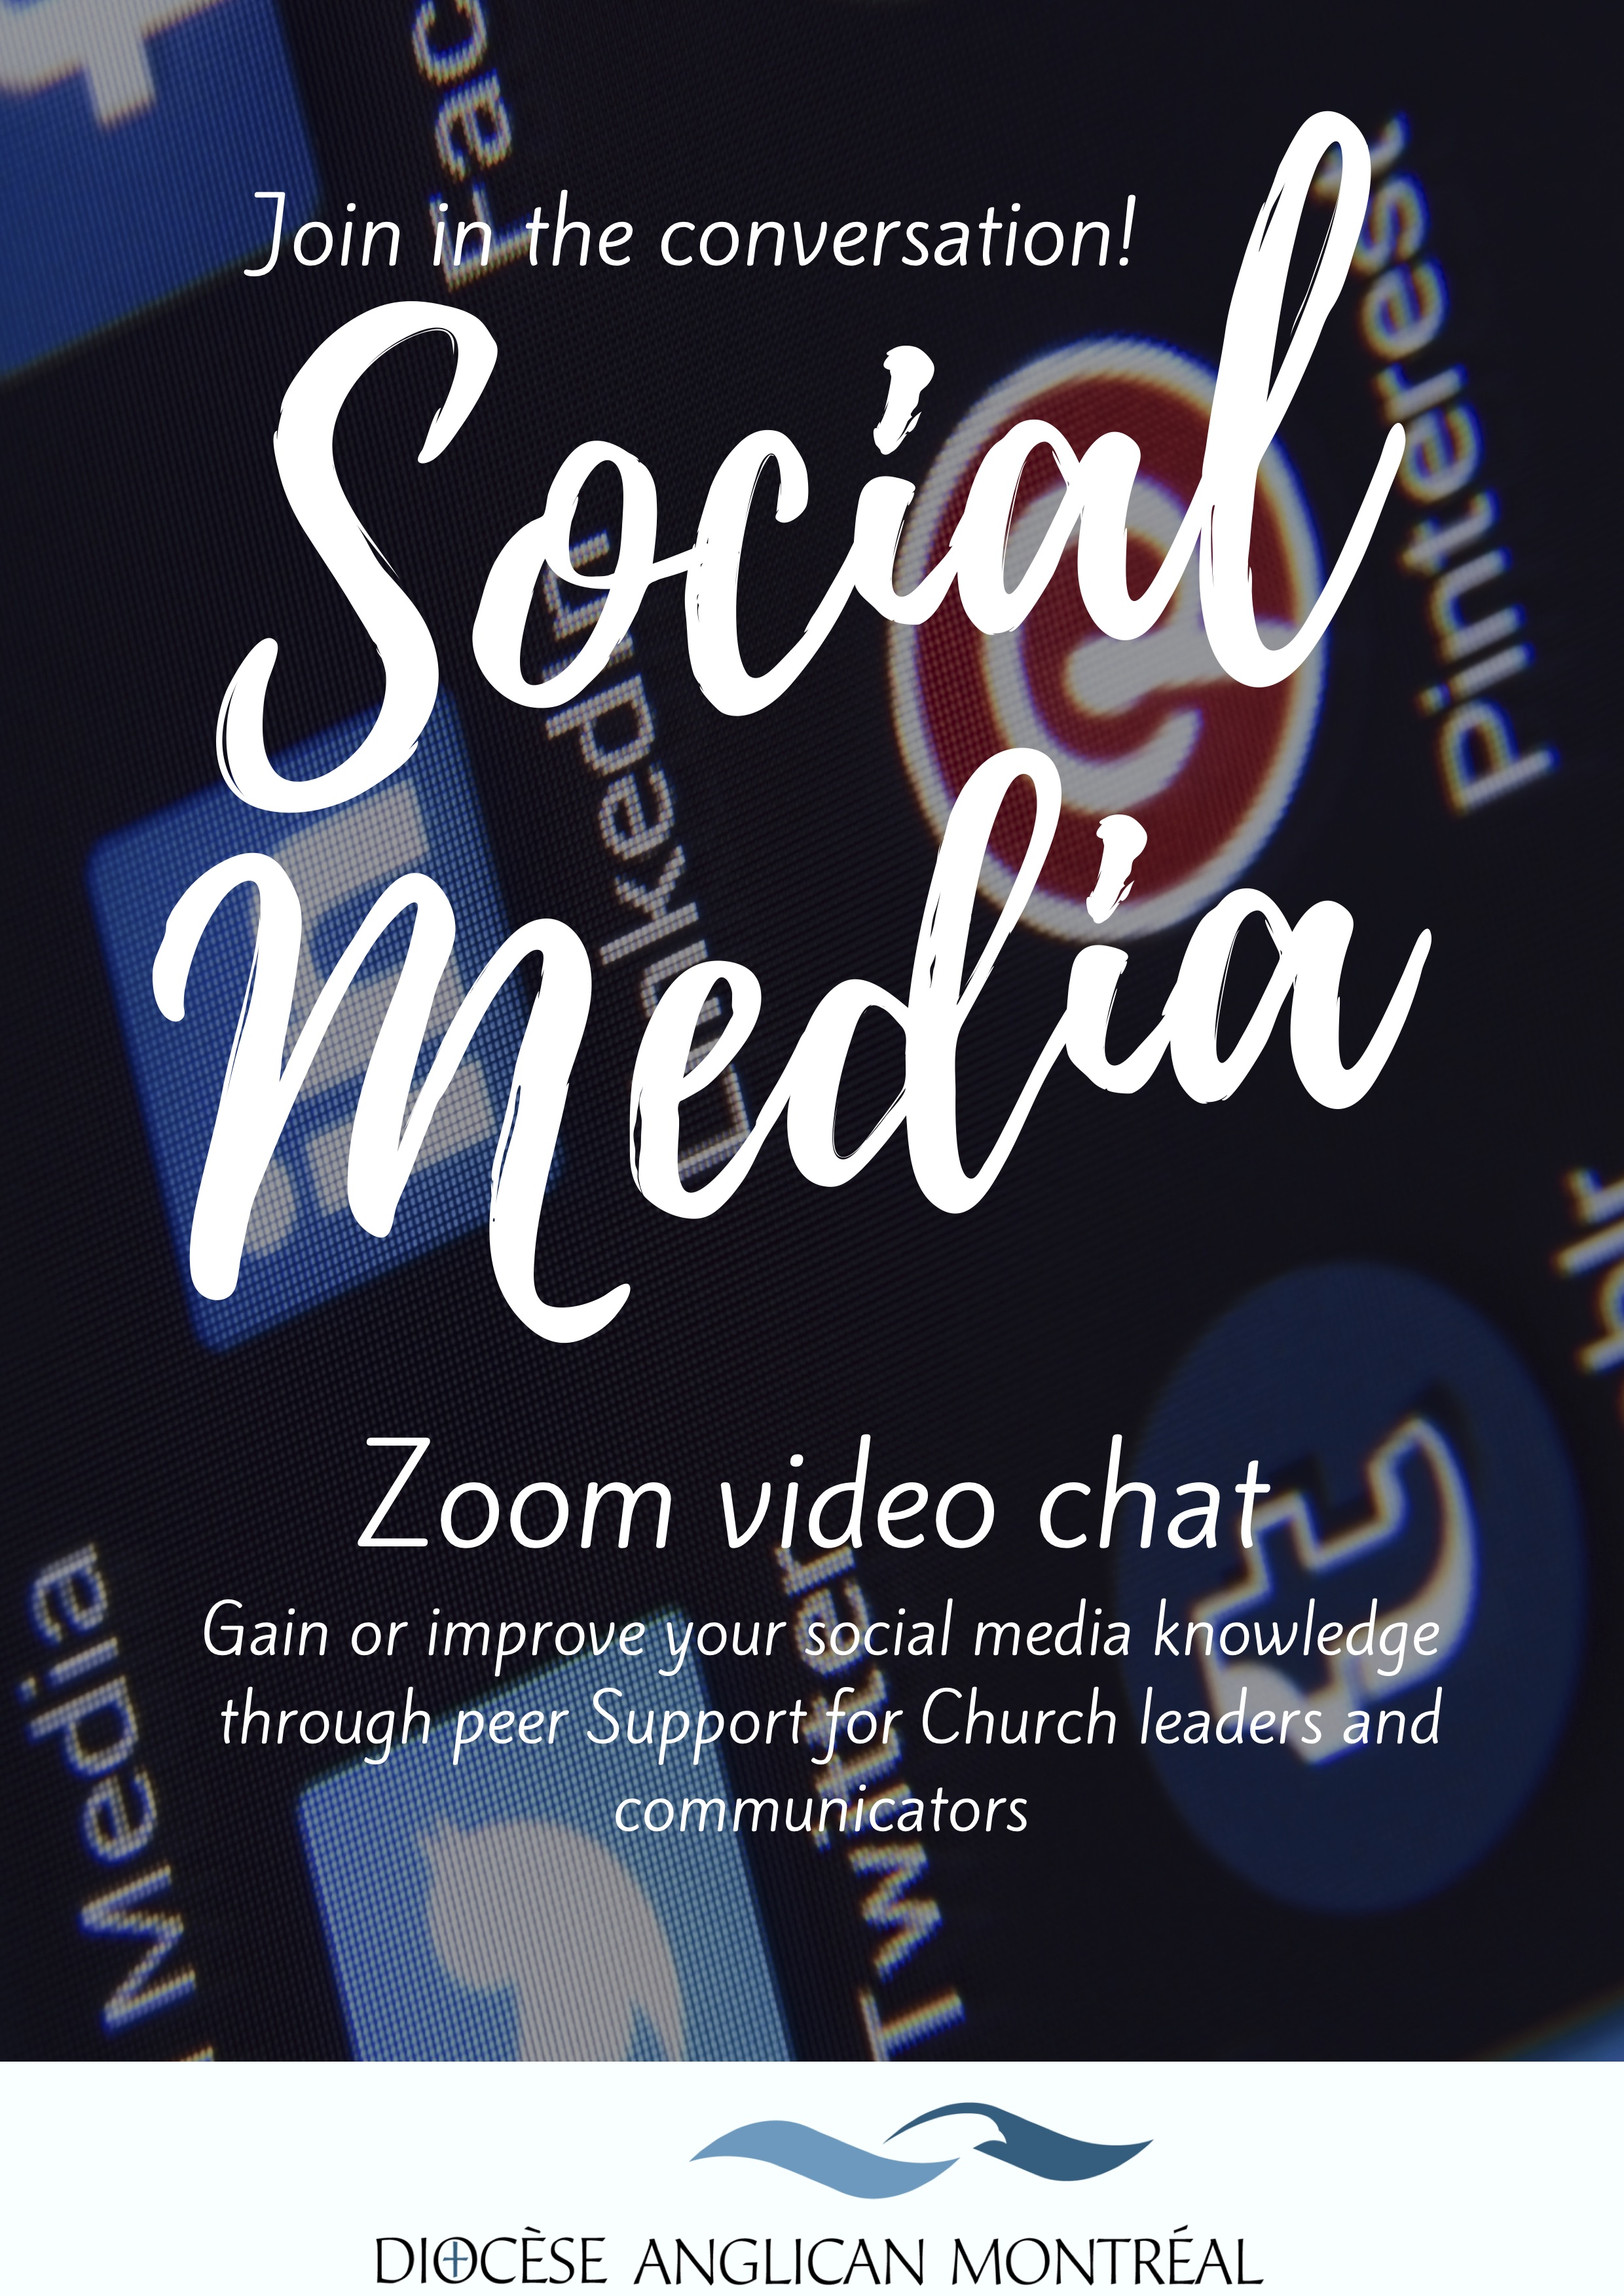 social media for churches (3) copy 2.jpg